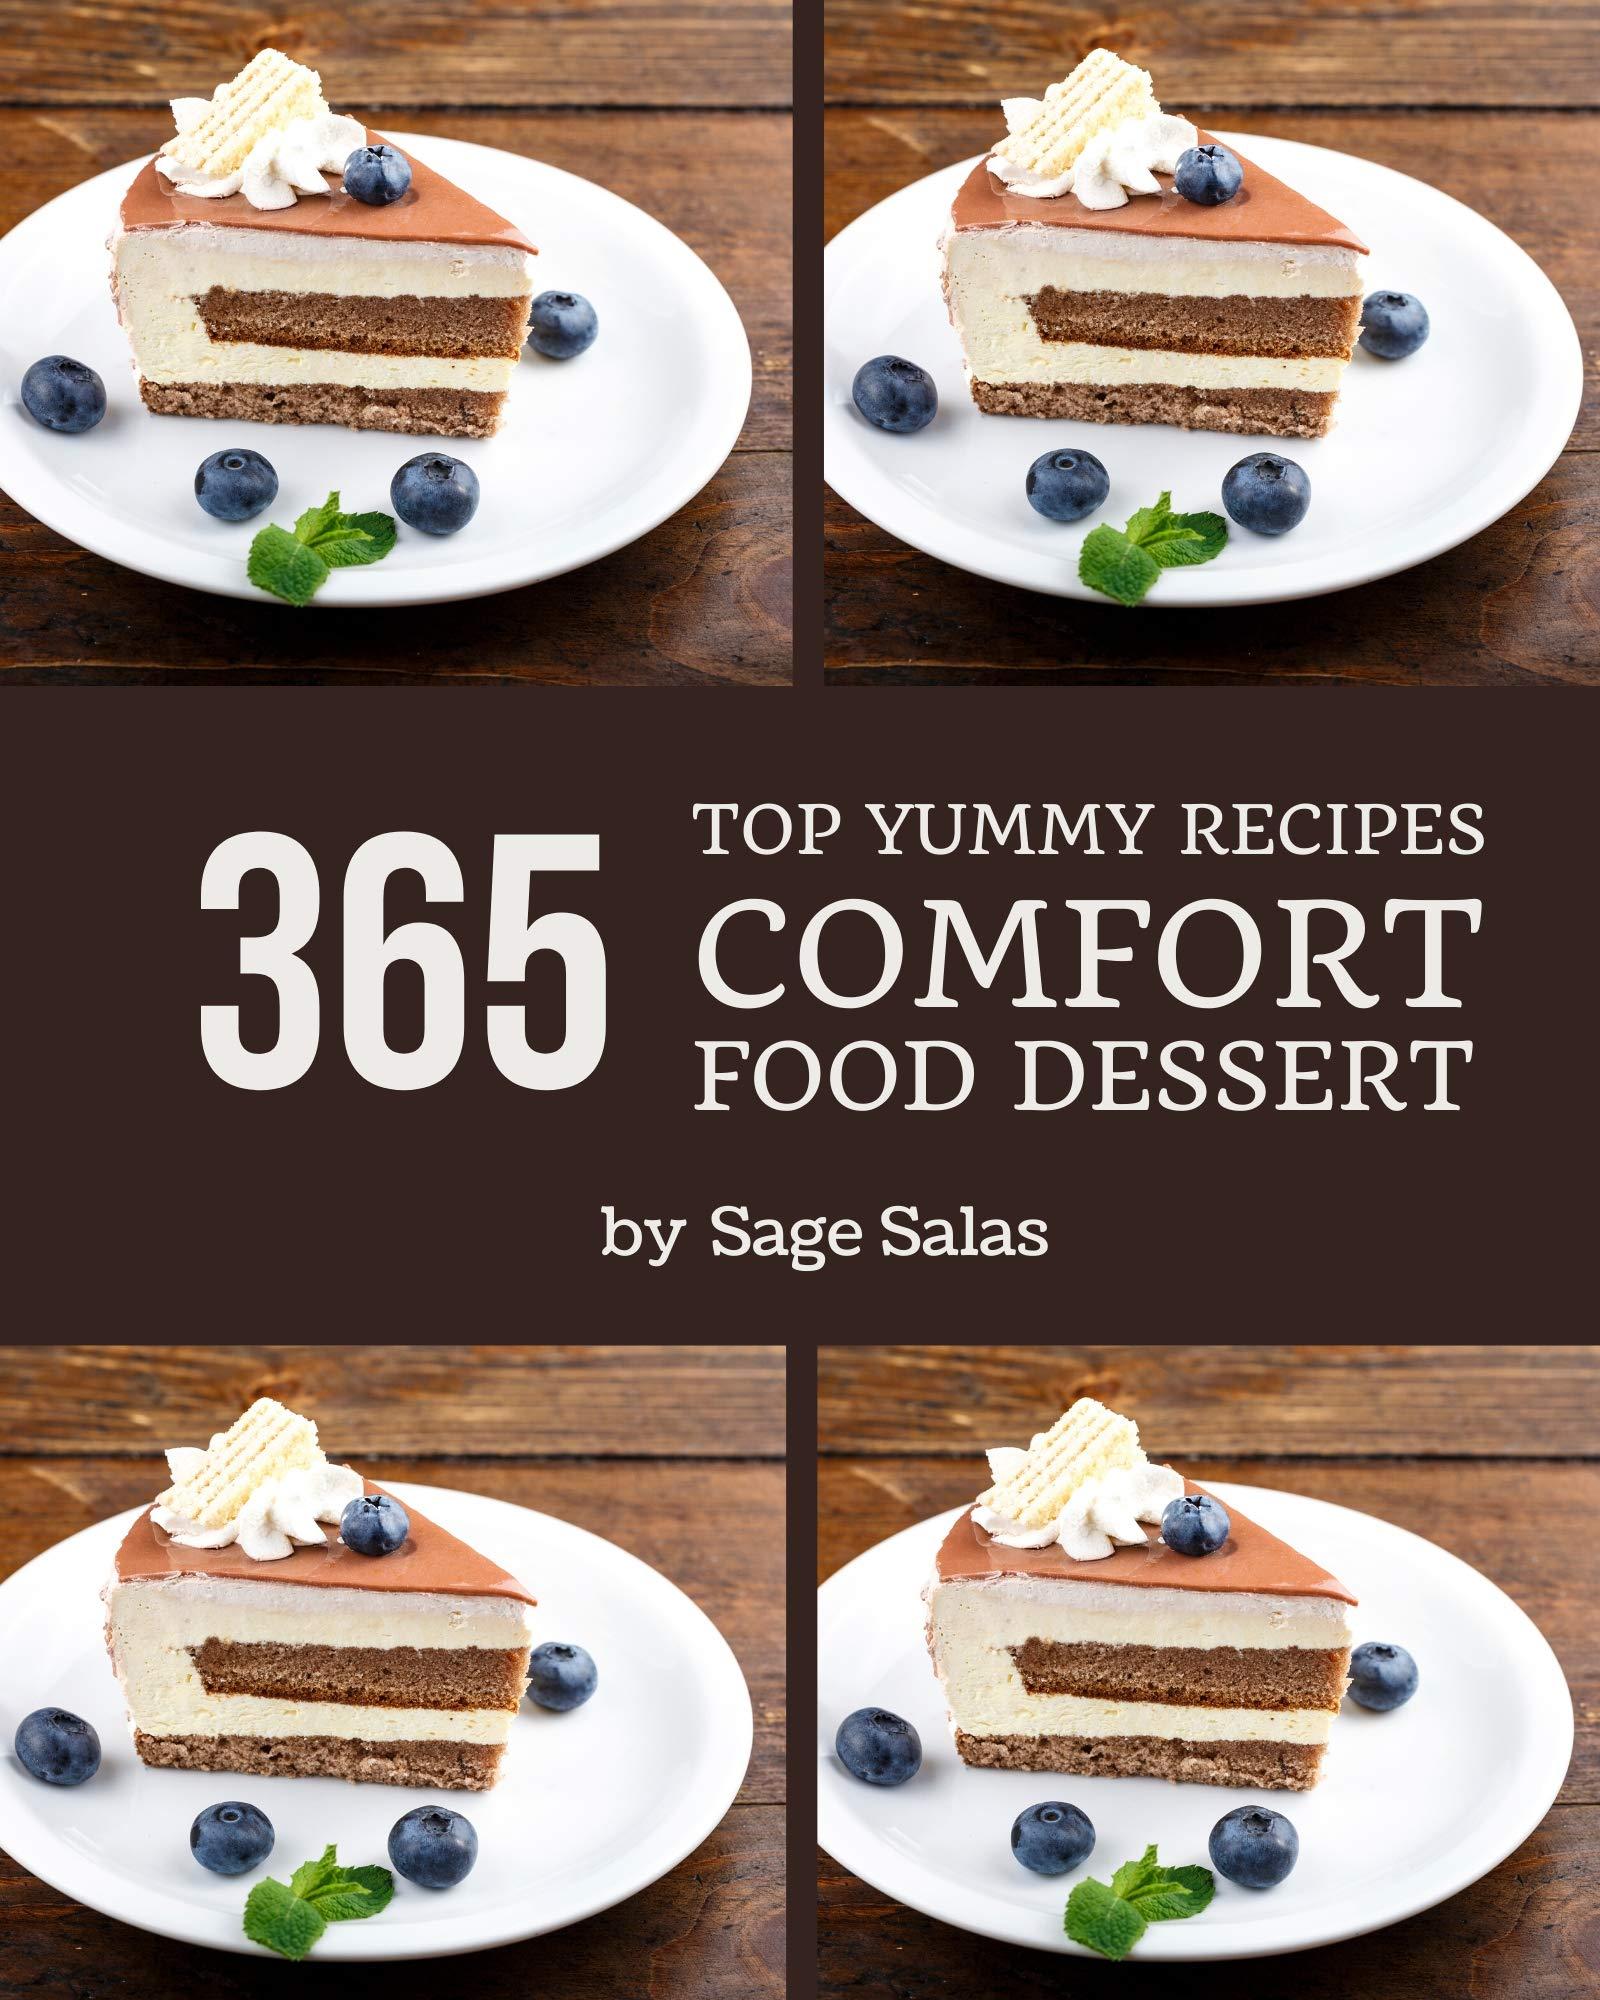 Top 365 Yummy Comfort Food Dessert Recipes: Unlocking Appetizing Recipes in The Best Yummy Comfort Food Dessert Cookbook!